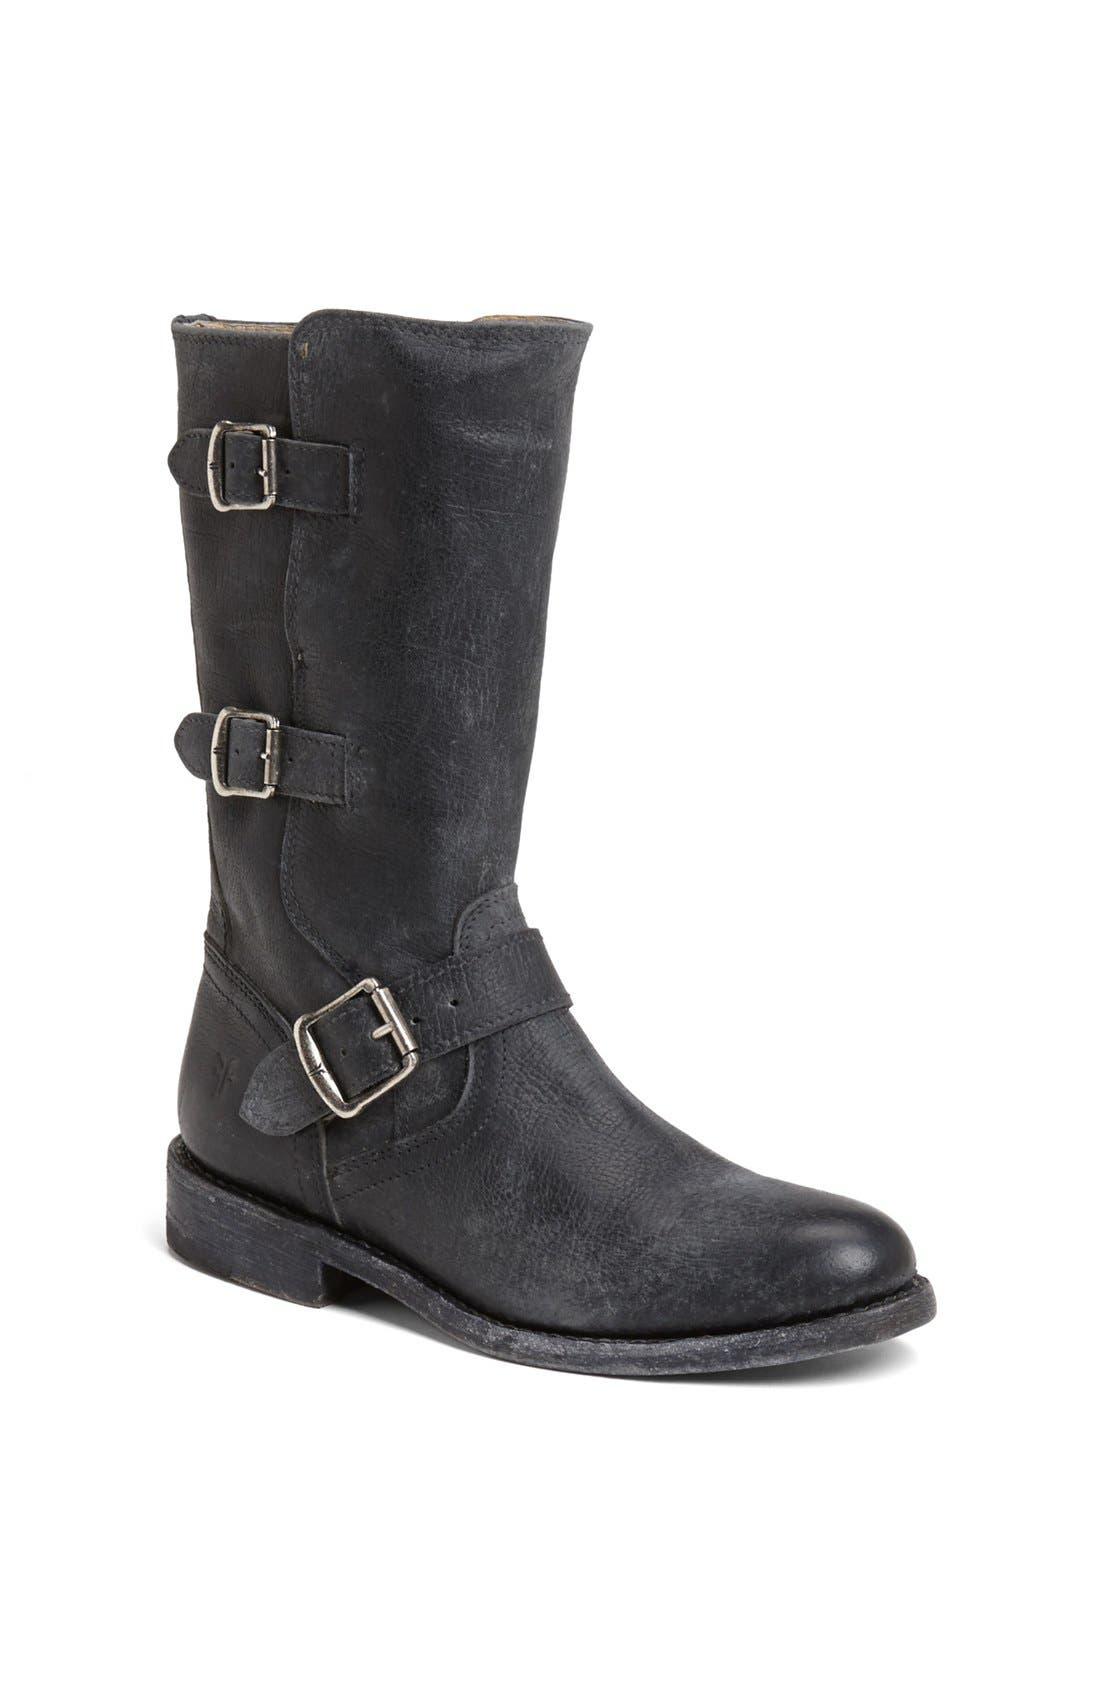 Alternate Image 1 Selected - Frye 'Jayden' Leather Moto Boot